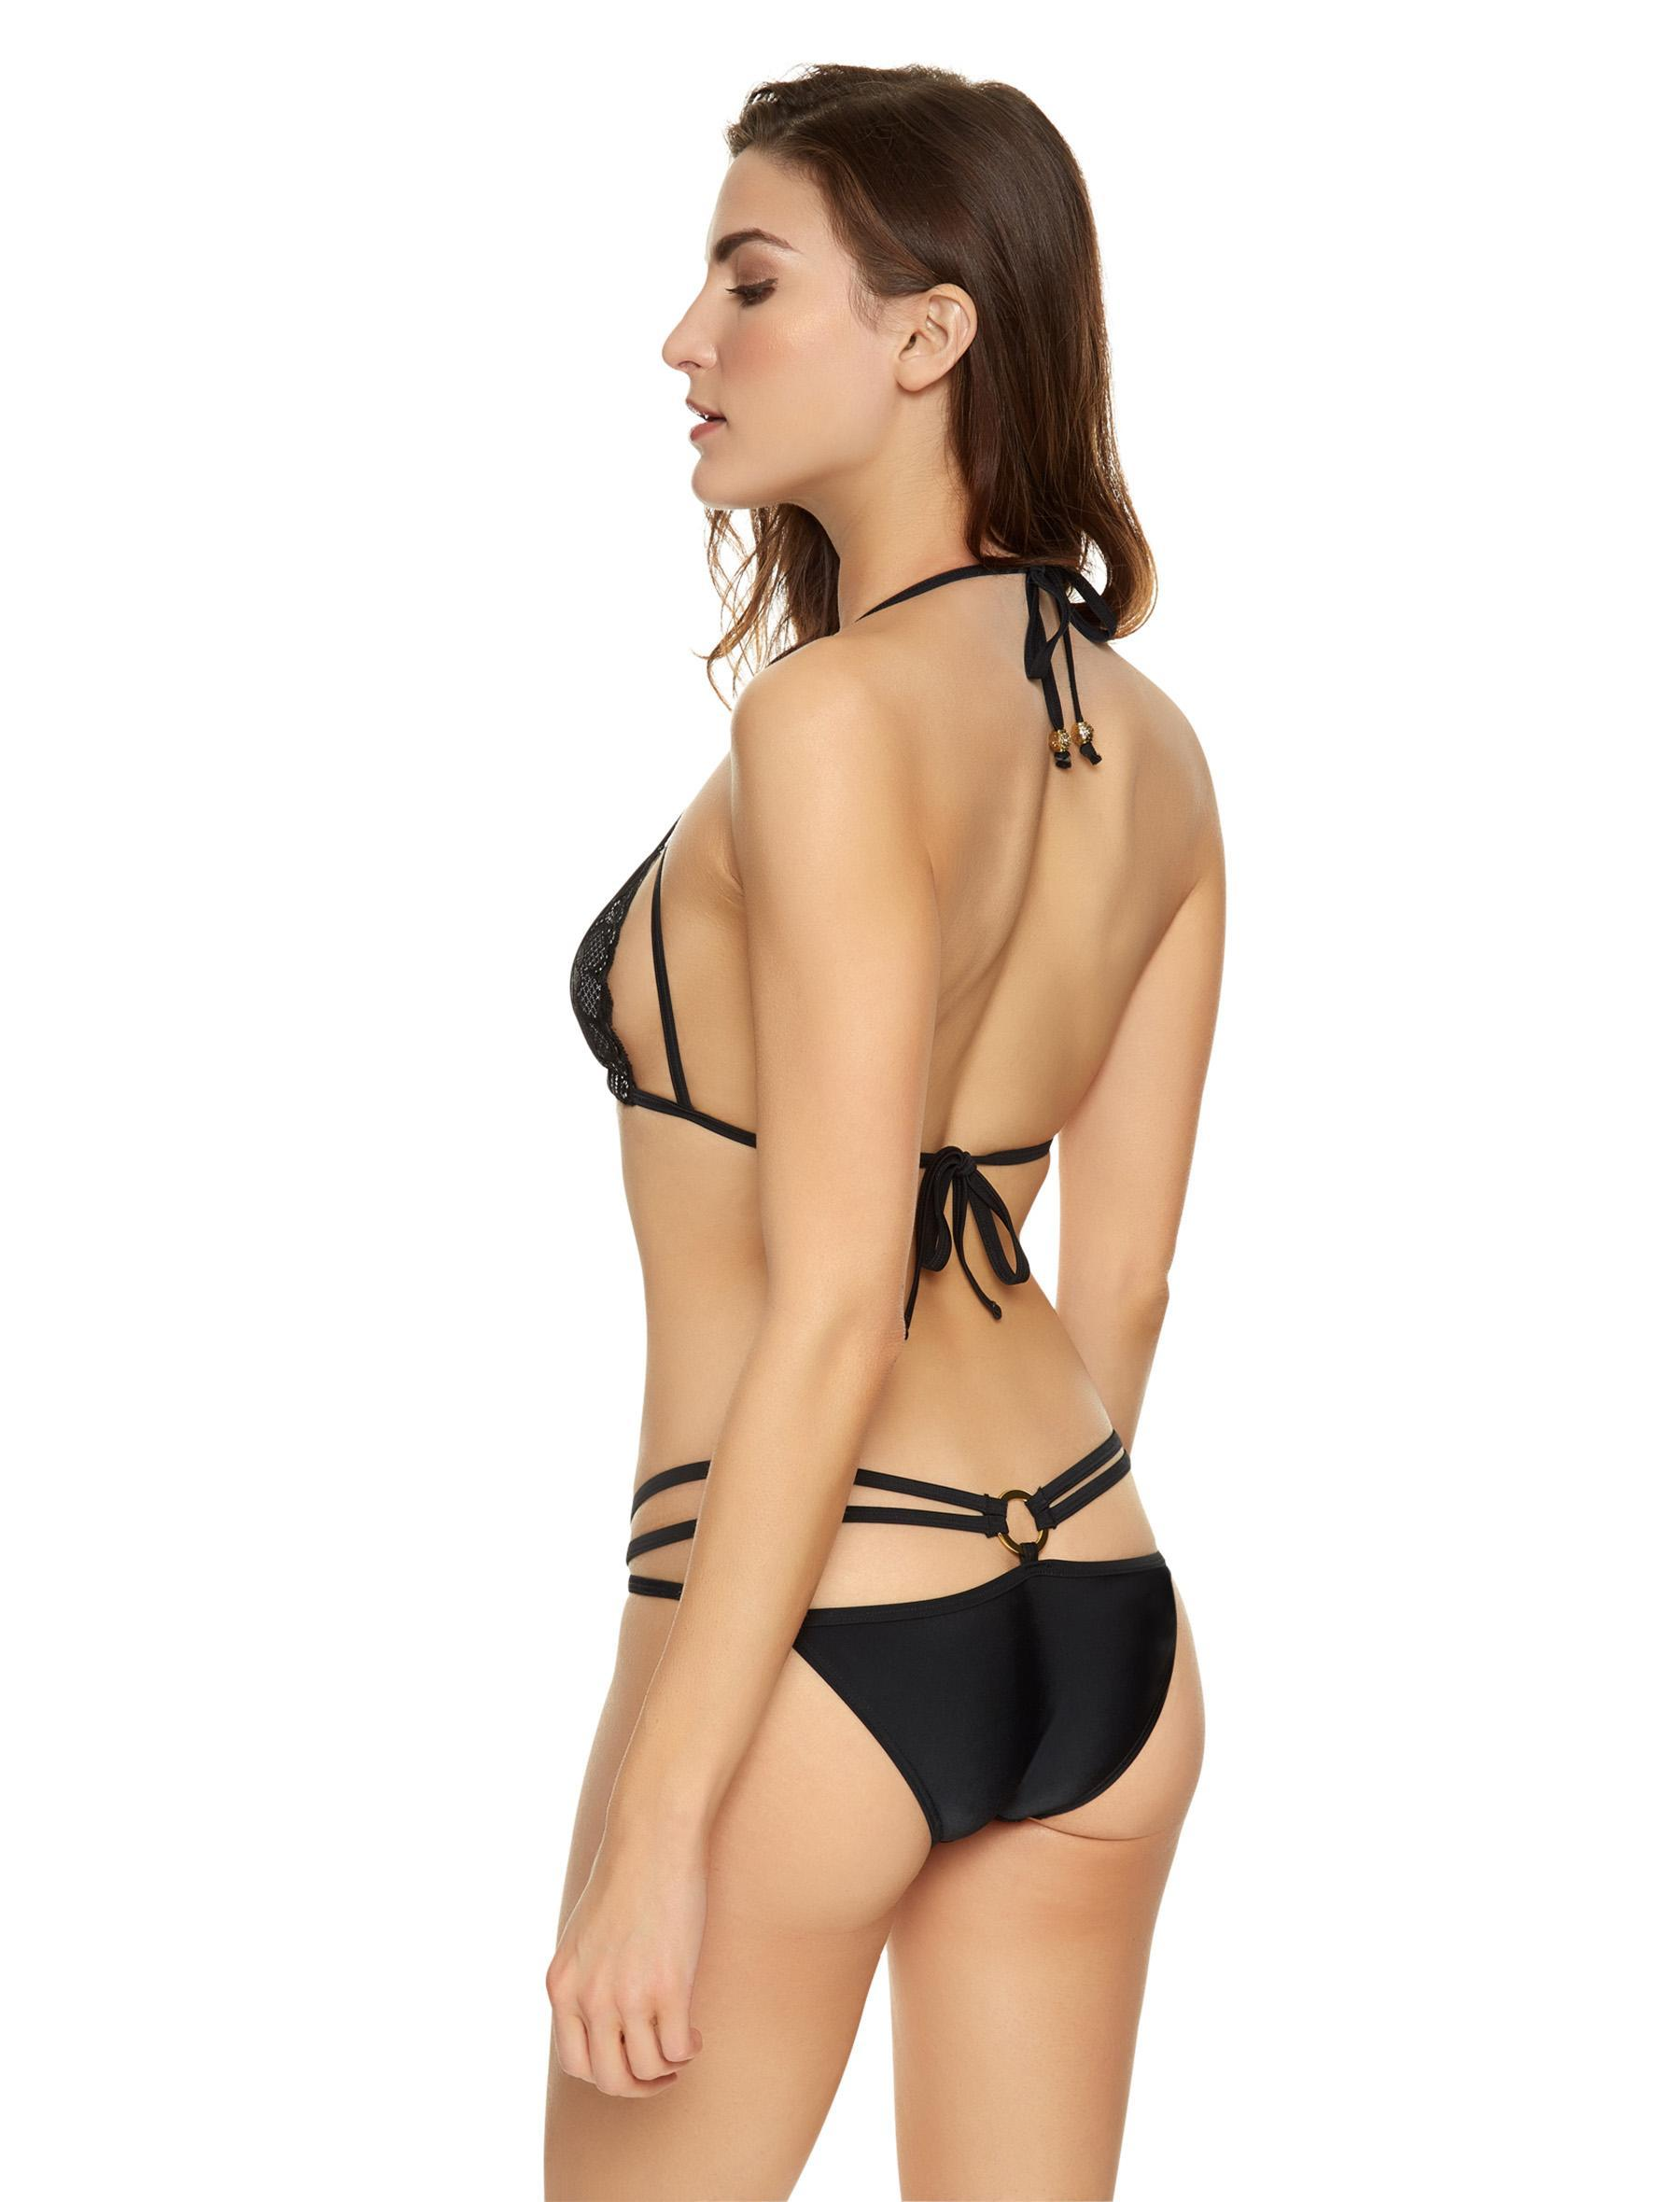 0c7a205a80 Ann Summers Womens Mai Lace Bikini Top Black Nude Sexy Swimwear Beachwear